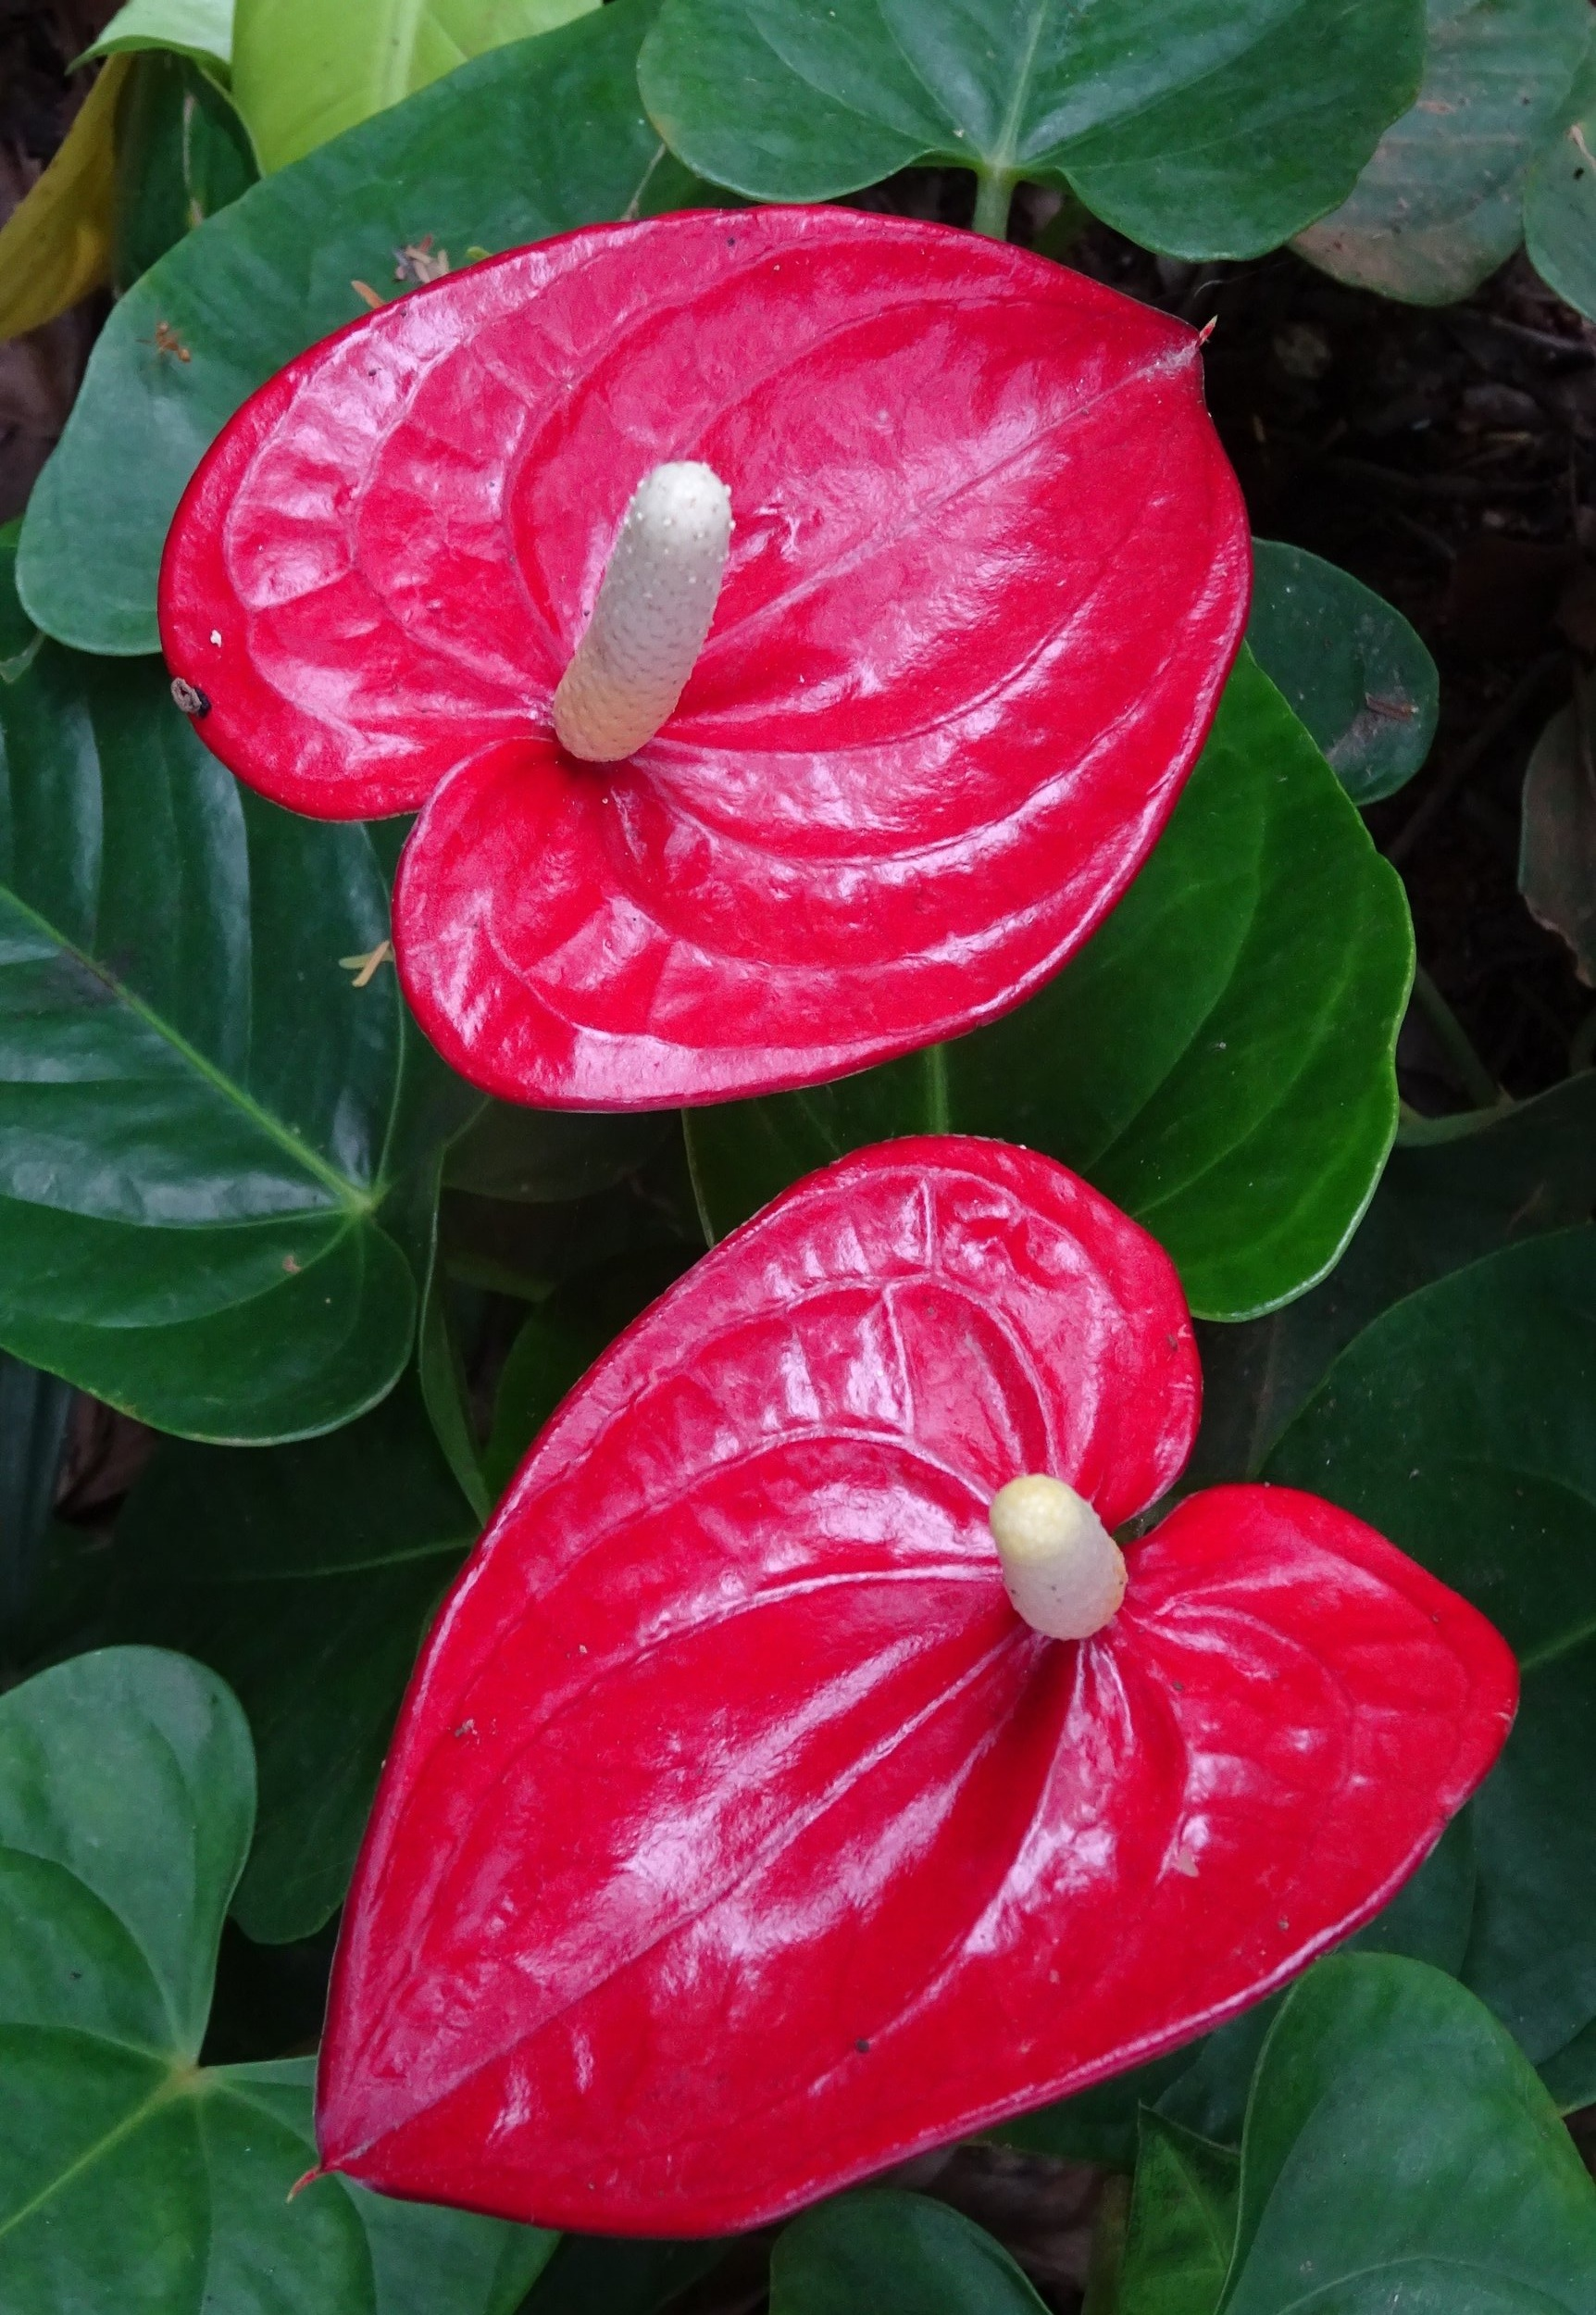 plant-flower-petal-food-red-produce-492246-pxhere.com+%281%29.jpg